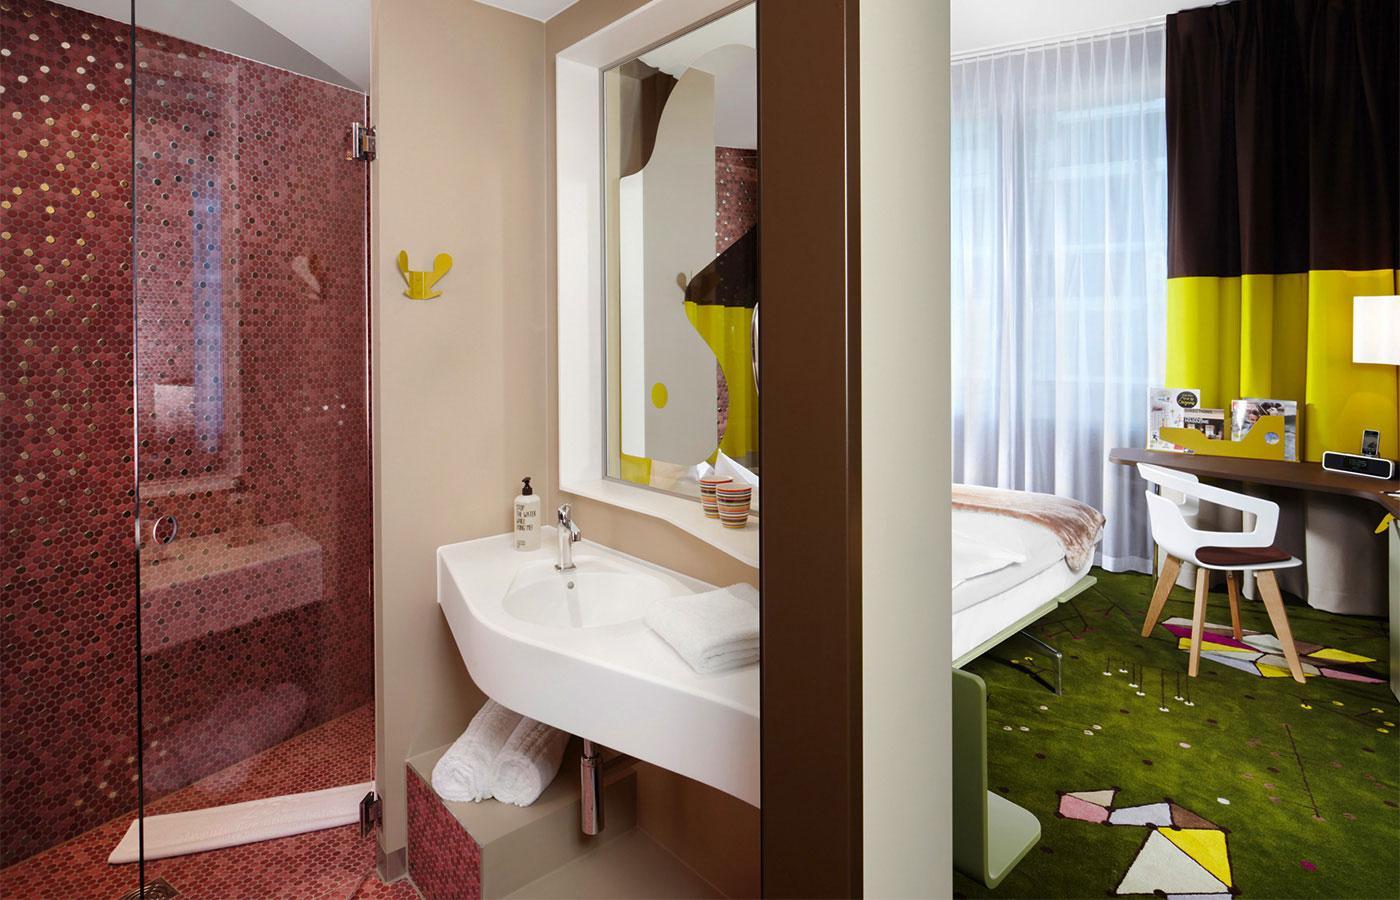 referenzen hotels restaurants bars jasba fliesen. Black Bedroom Furniture Sets. Home Design Ideas